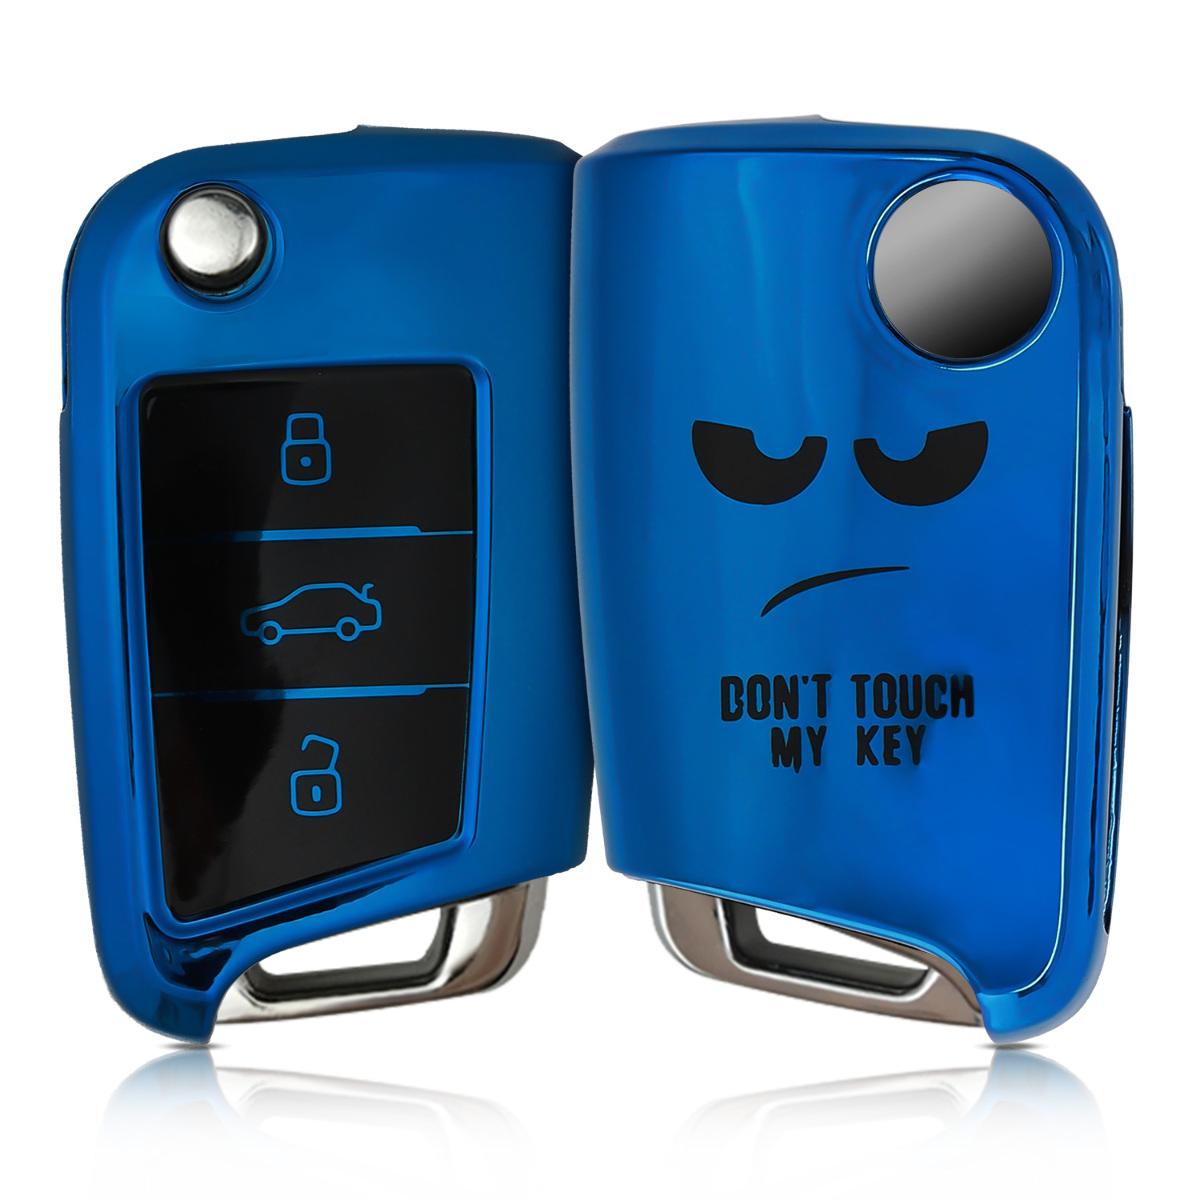 KW Θήκη Κλειδιού VW Golf 7 MK7 - Σιλικόνη - 3 Κουμπιά - Don't Touch My Key - Black / Blue High Gloss (50279.05)